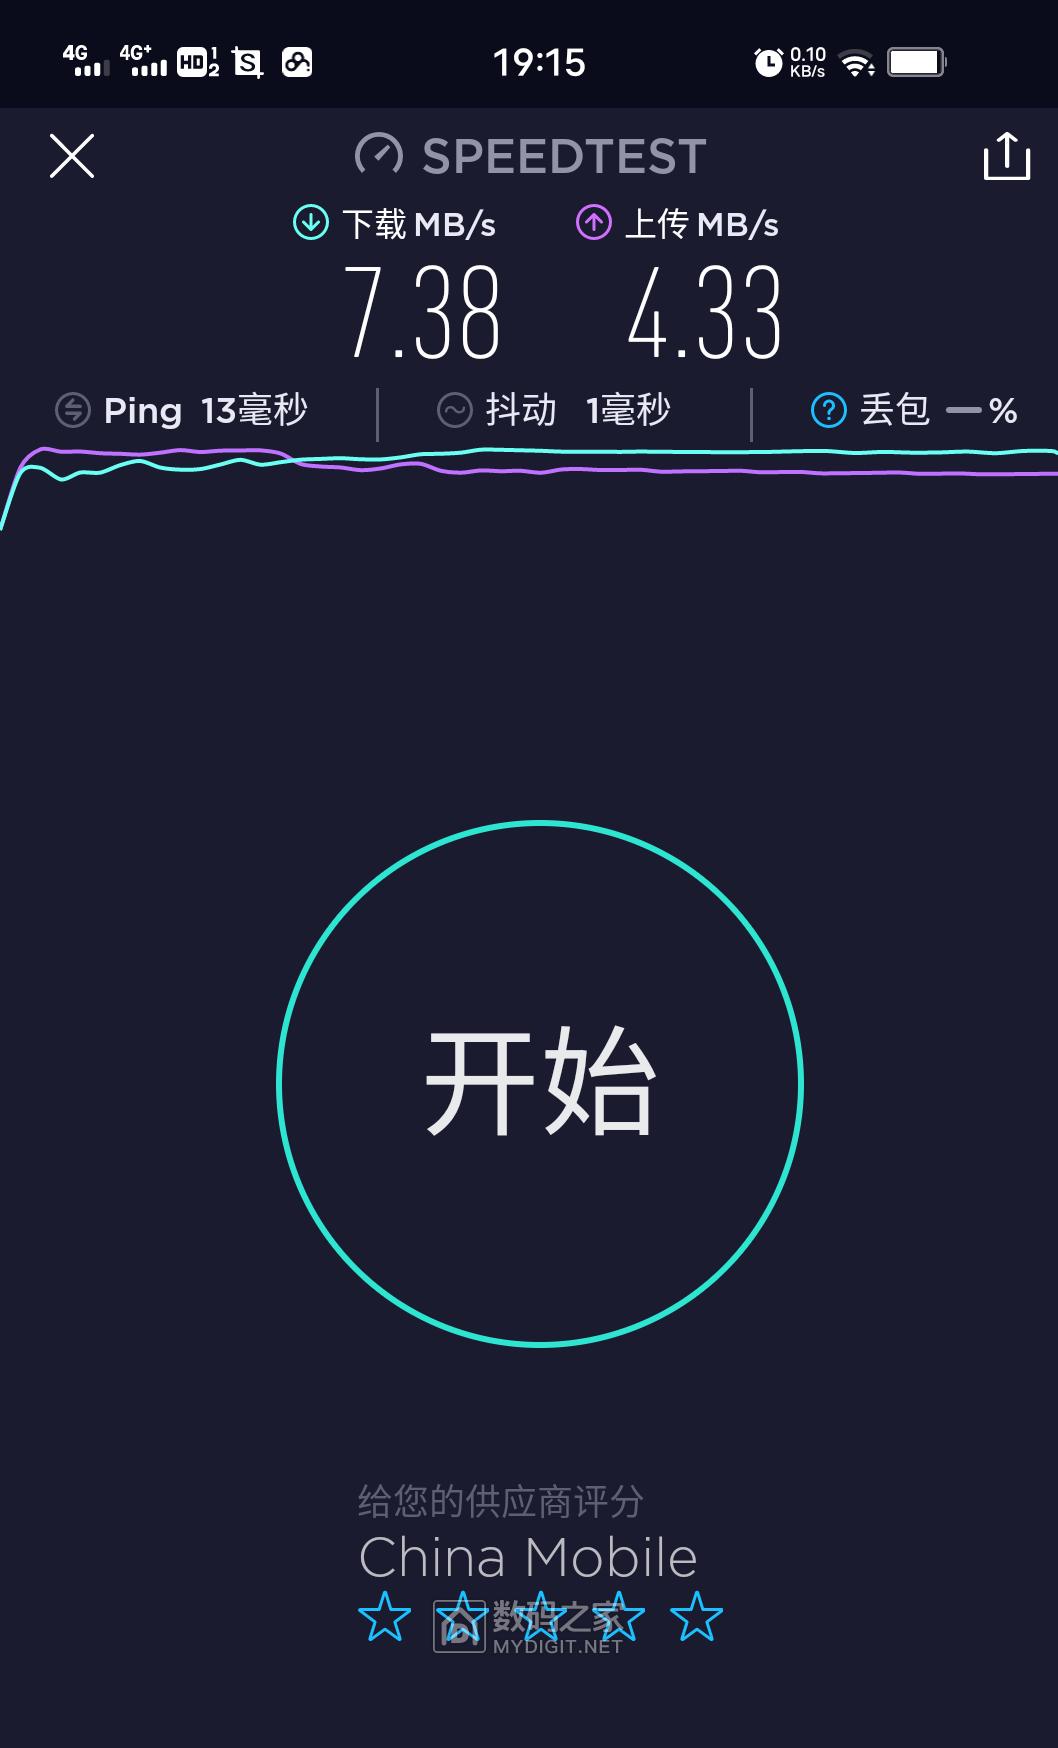 Screenshot_2021_0606_191549.png